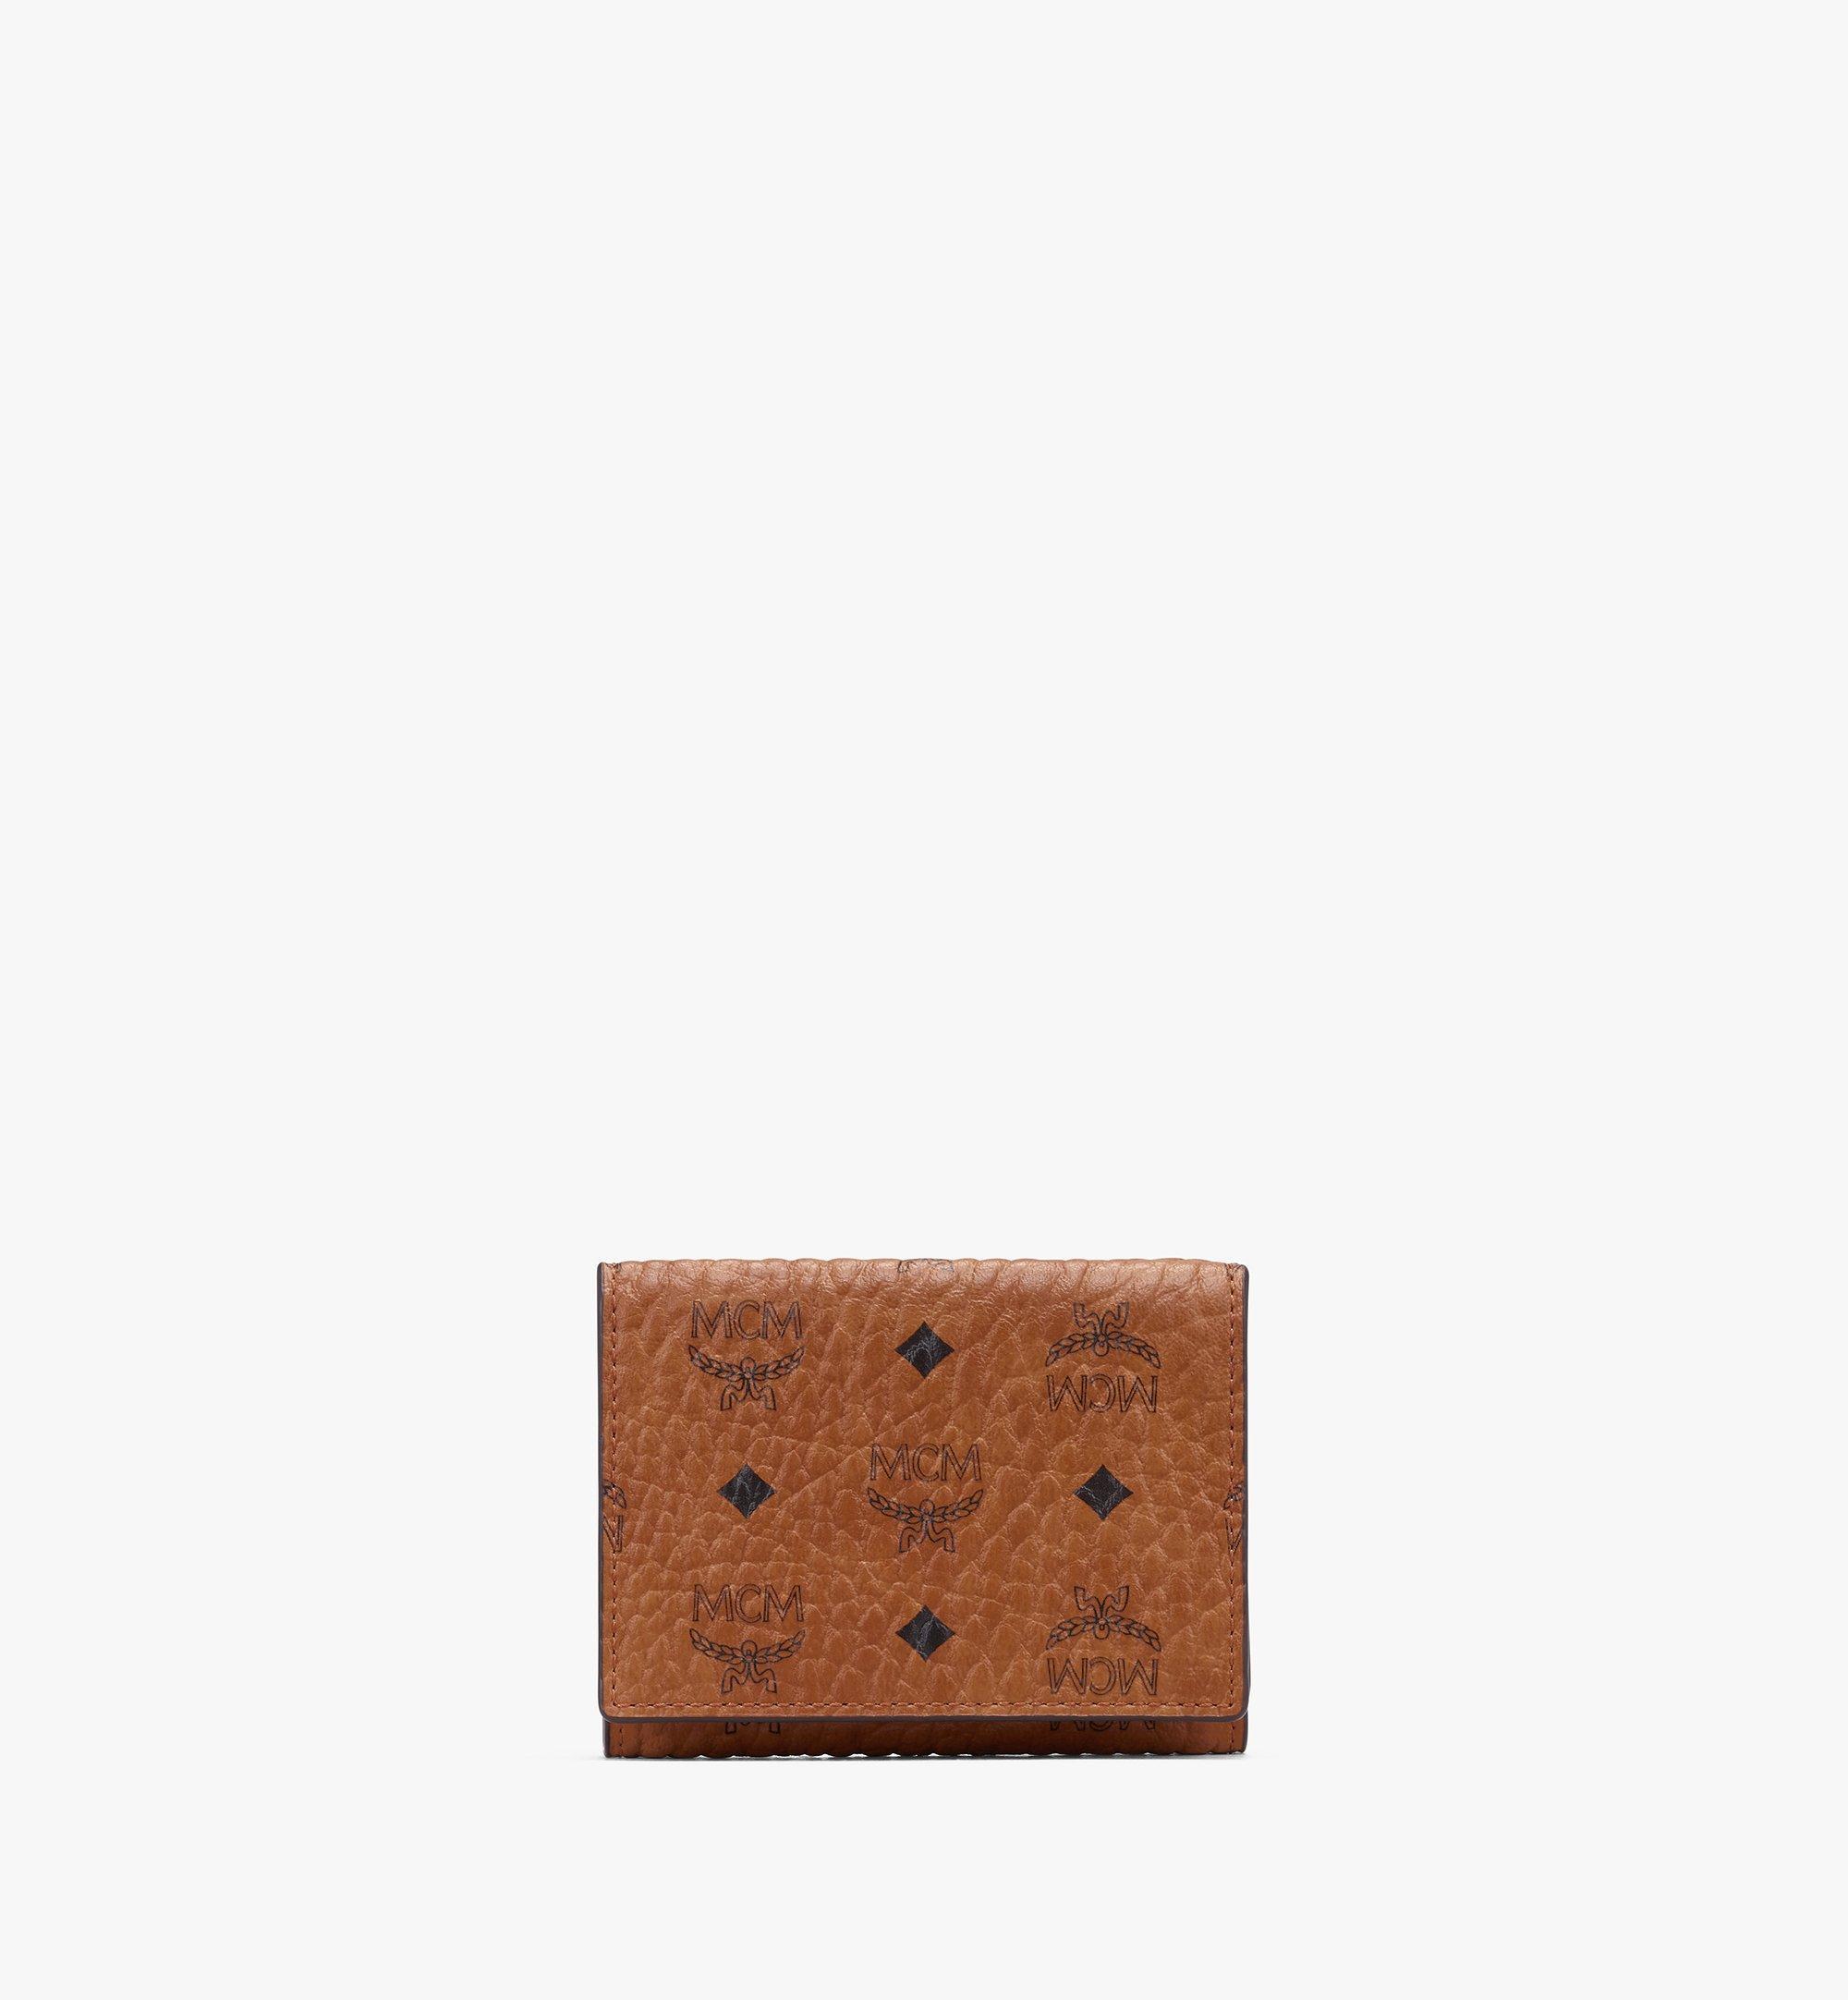 MCM กระเป๋าสตางค์พับสามทบลาย Visetos Cognac MYAASVI01CO001 มุมมองอื่น 1